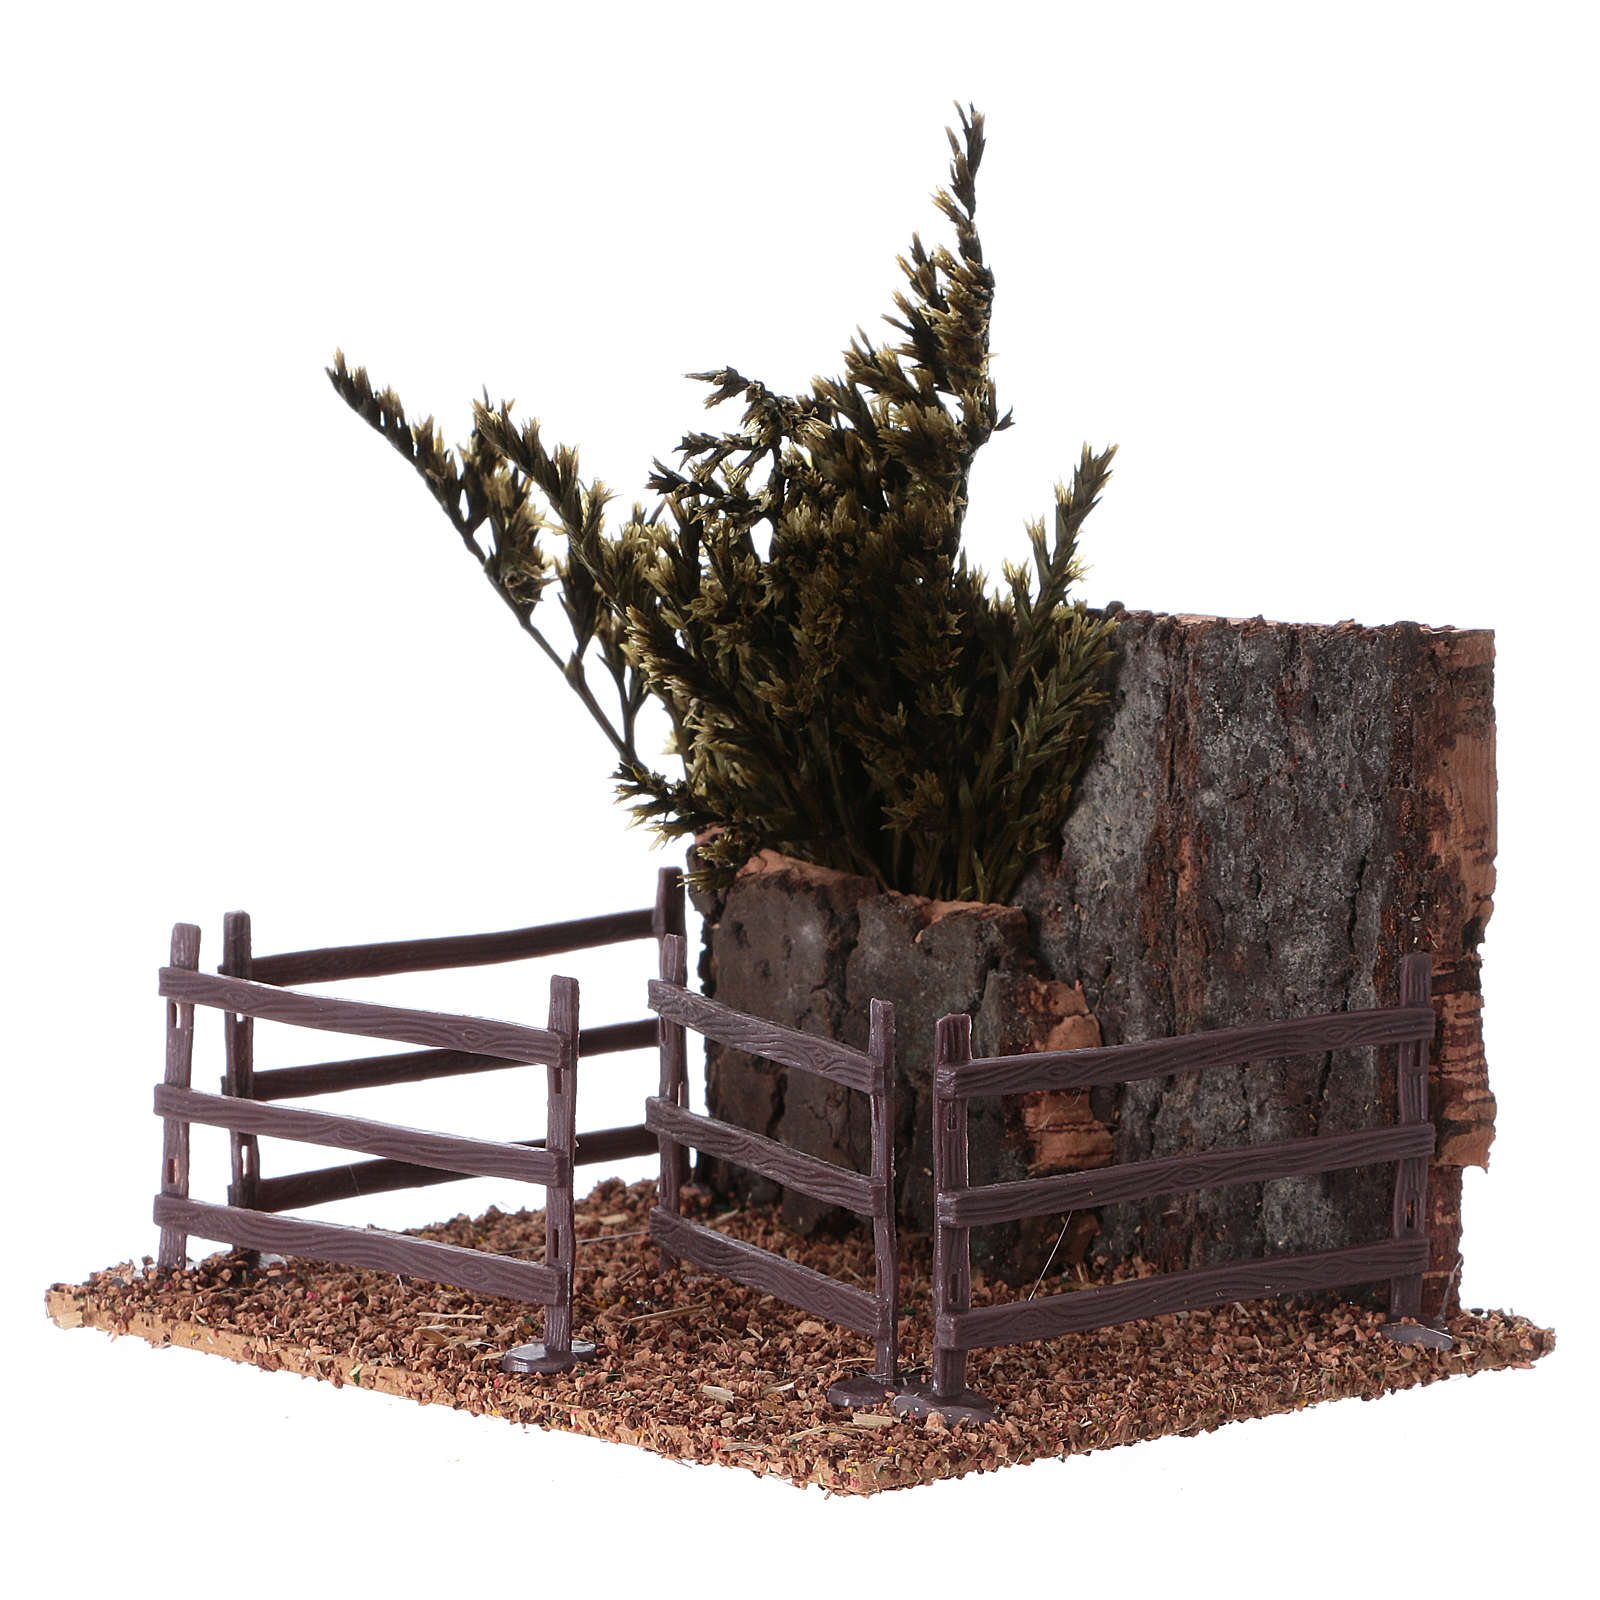 Cork fence for animals 15x15x10 cm Nativity scene 3